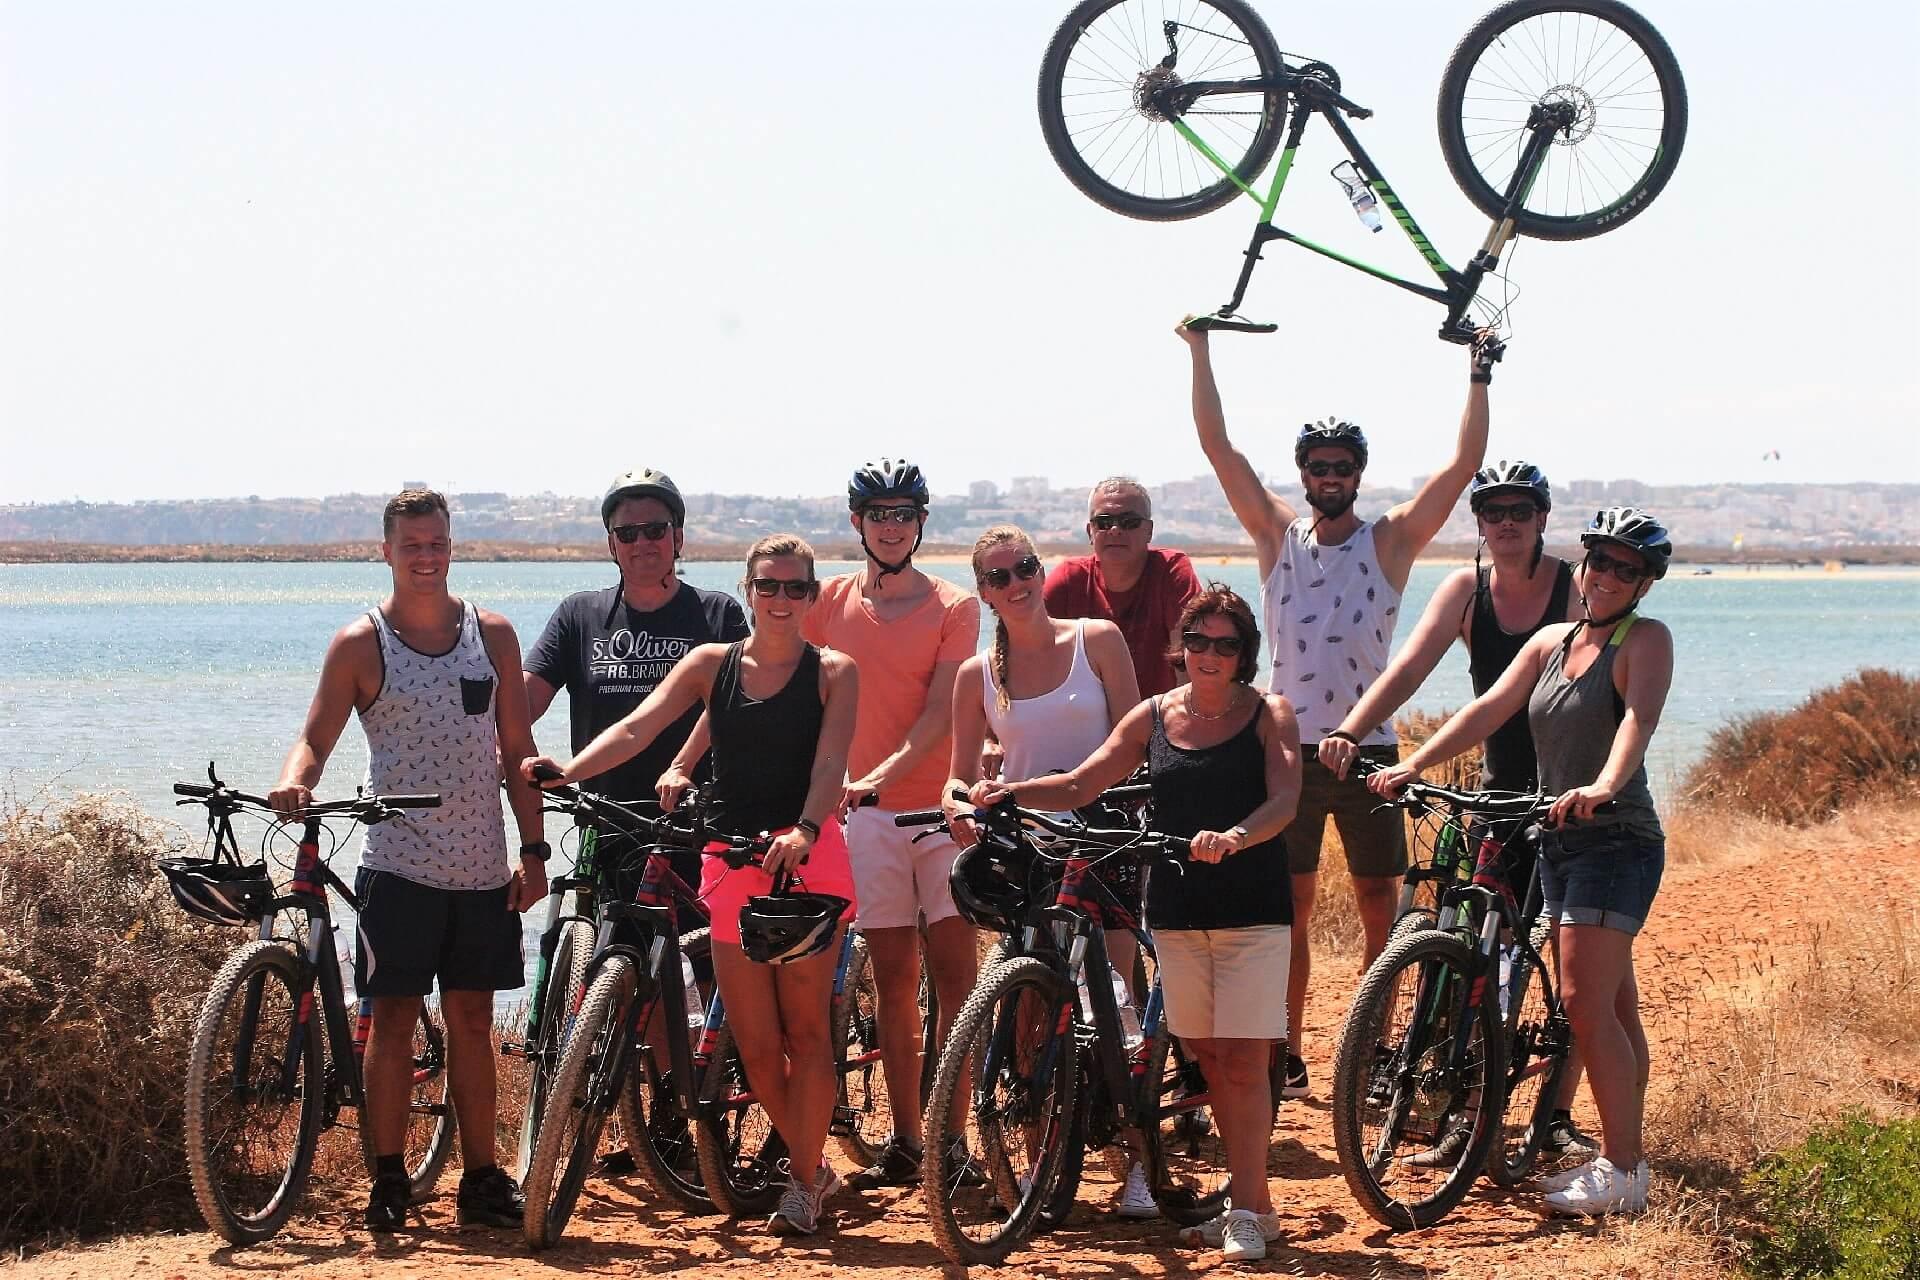 Algarve-Radtour mit Ihrem Team